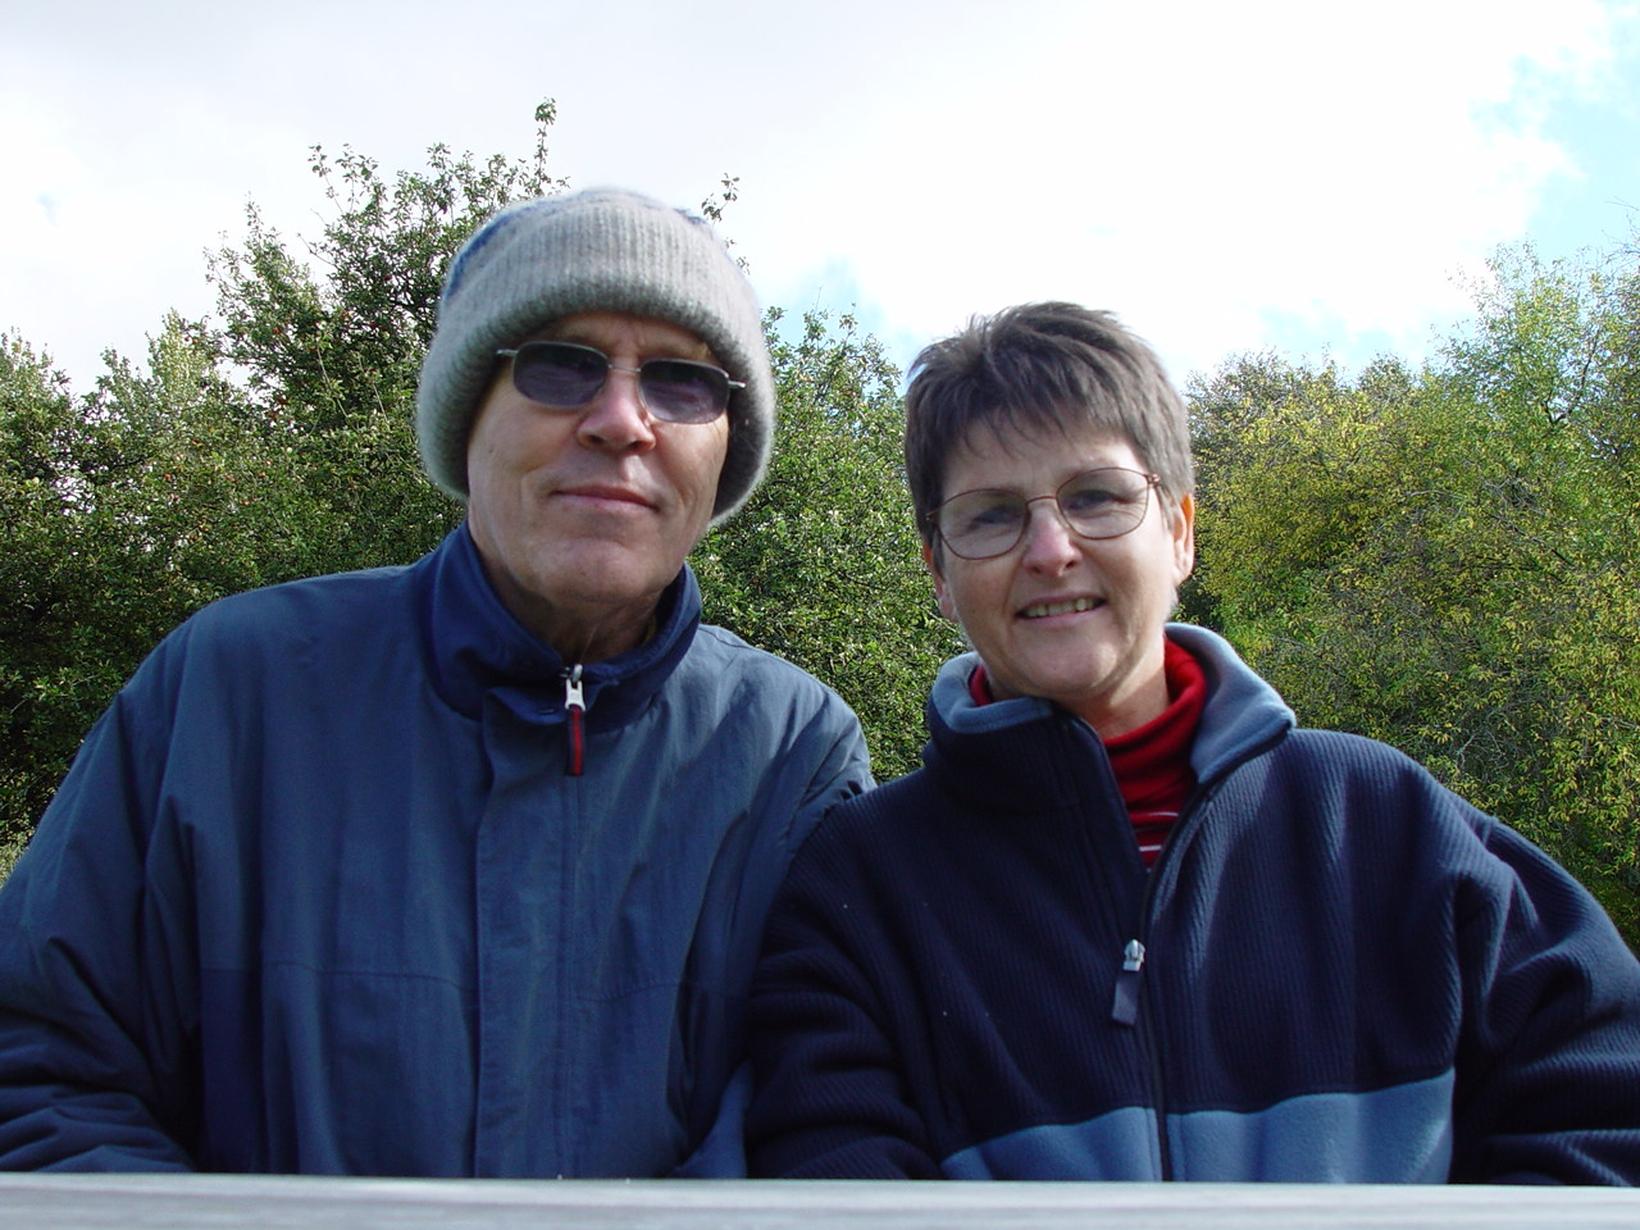 Ken & May from Redbank Plains, Queensland, Australia